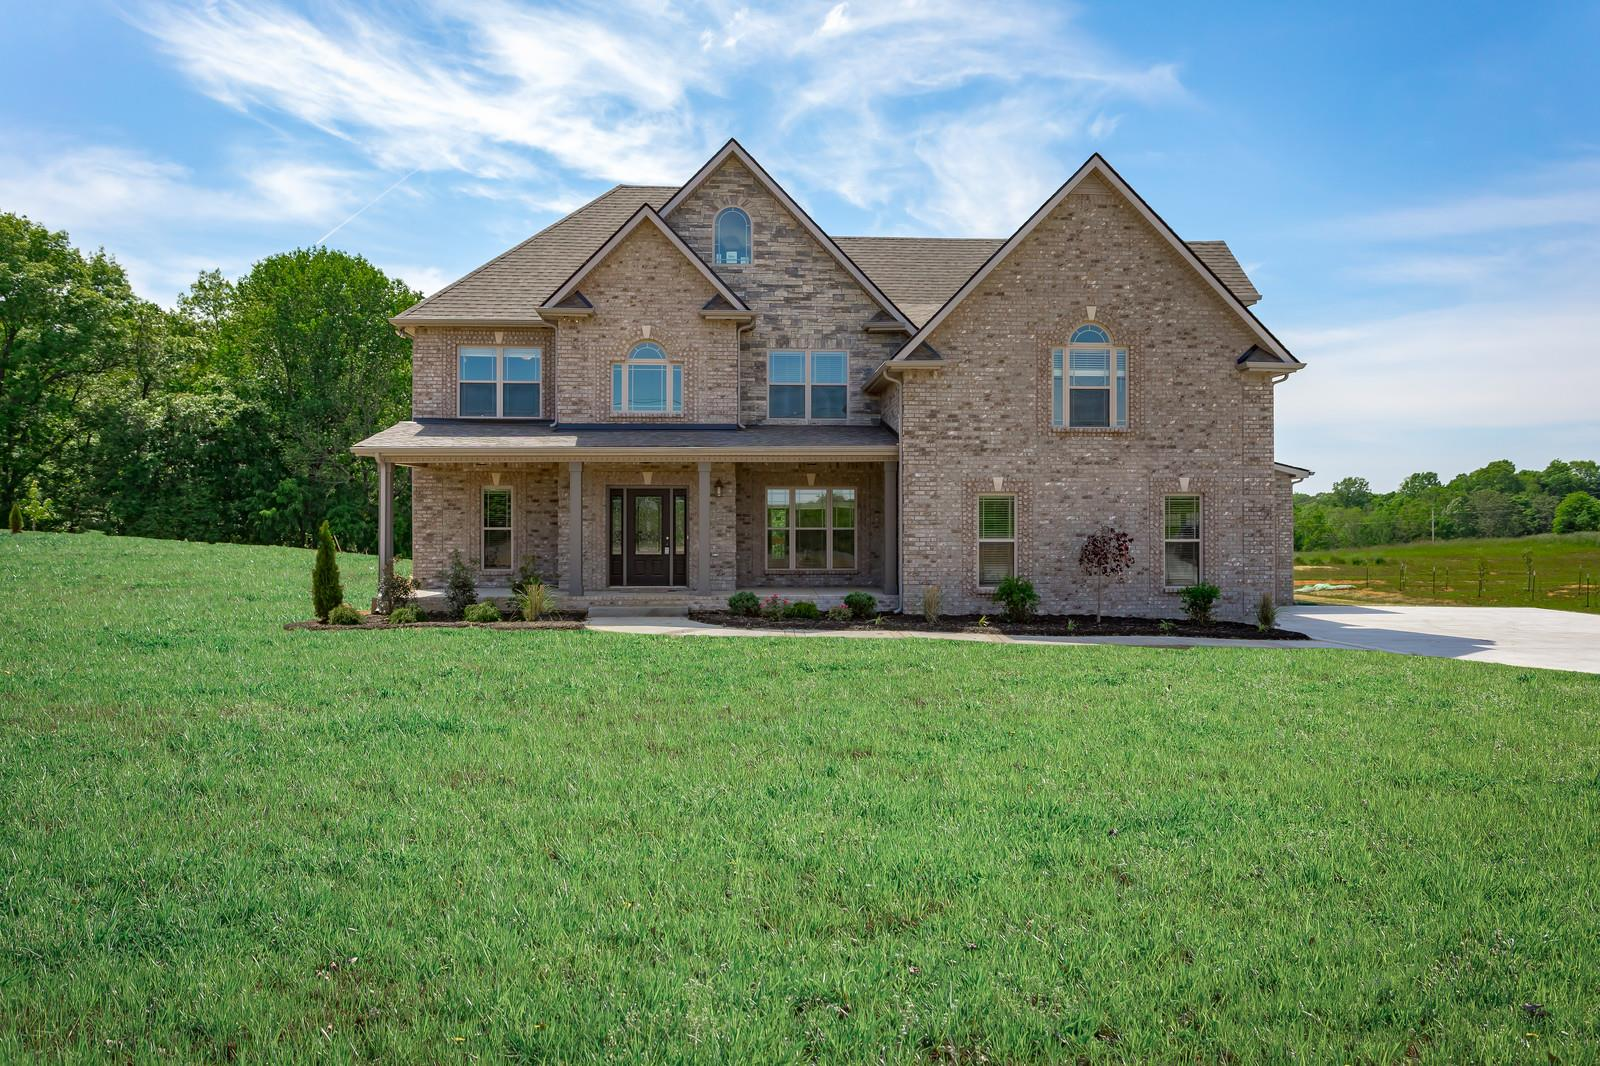 1893 Fenn Lane, Clarksville, TN 37043 - Clarksville, TN real estate listing